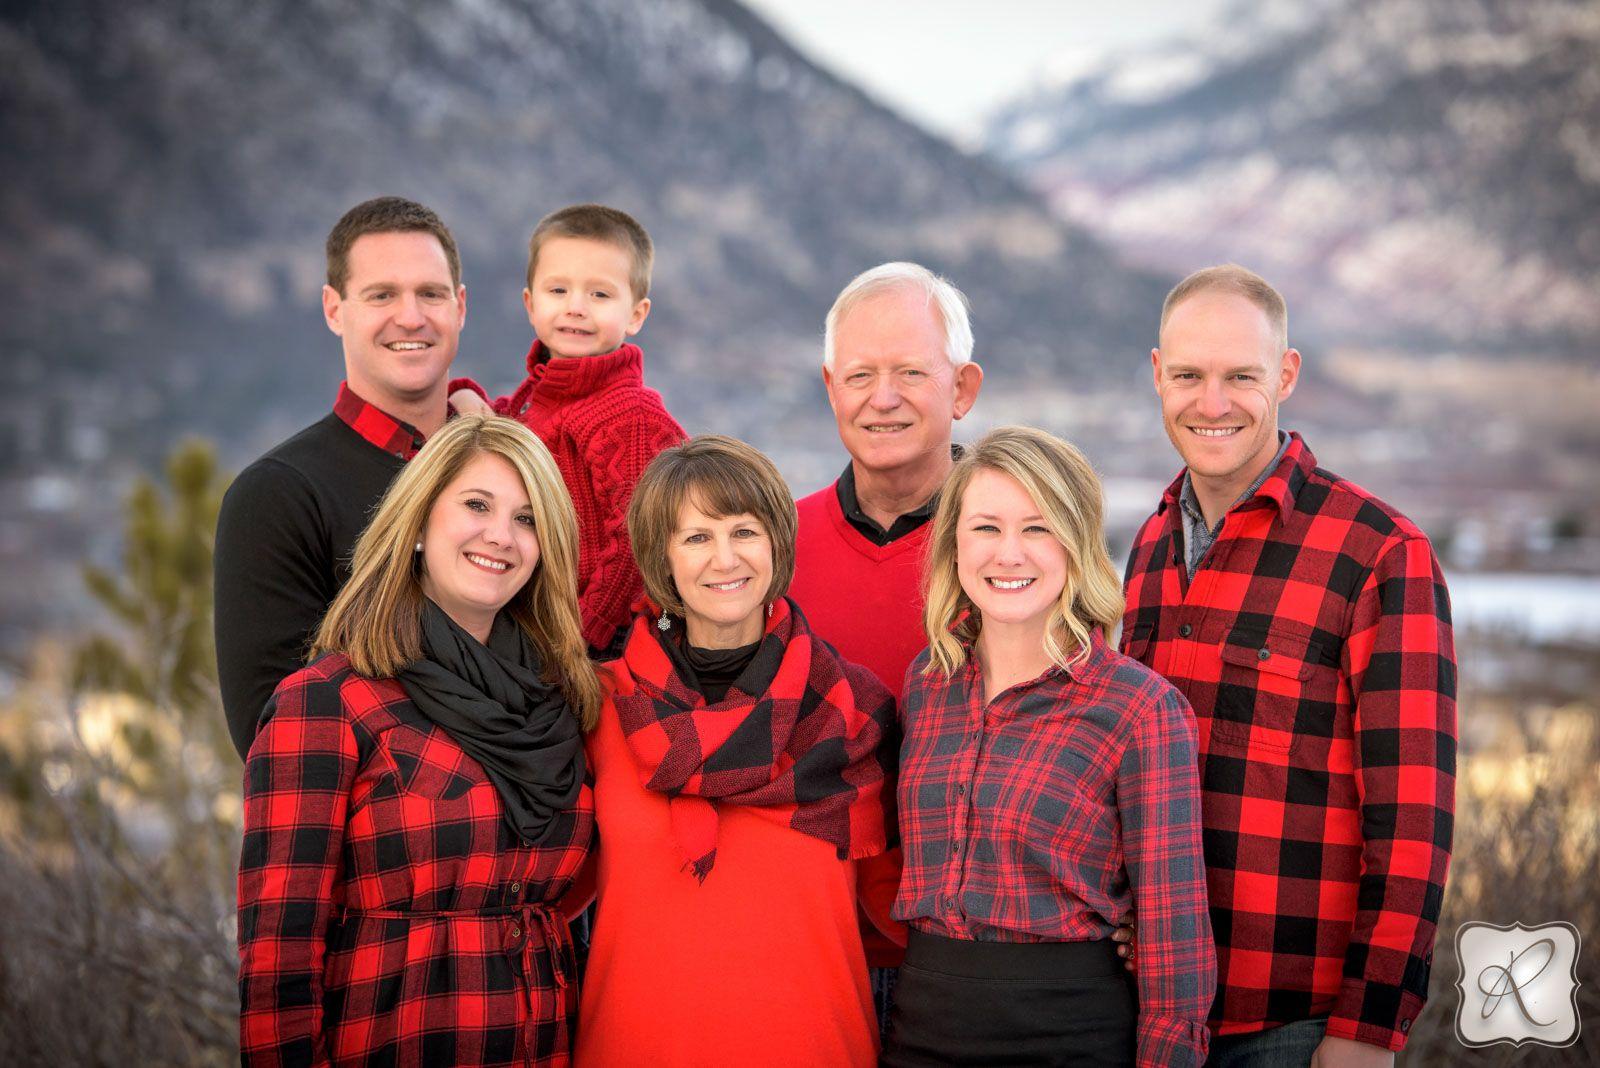 Mangus Family Portraits in Durango | Pinterest | Red flannel ...